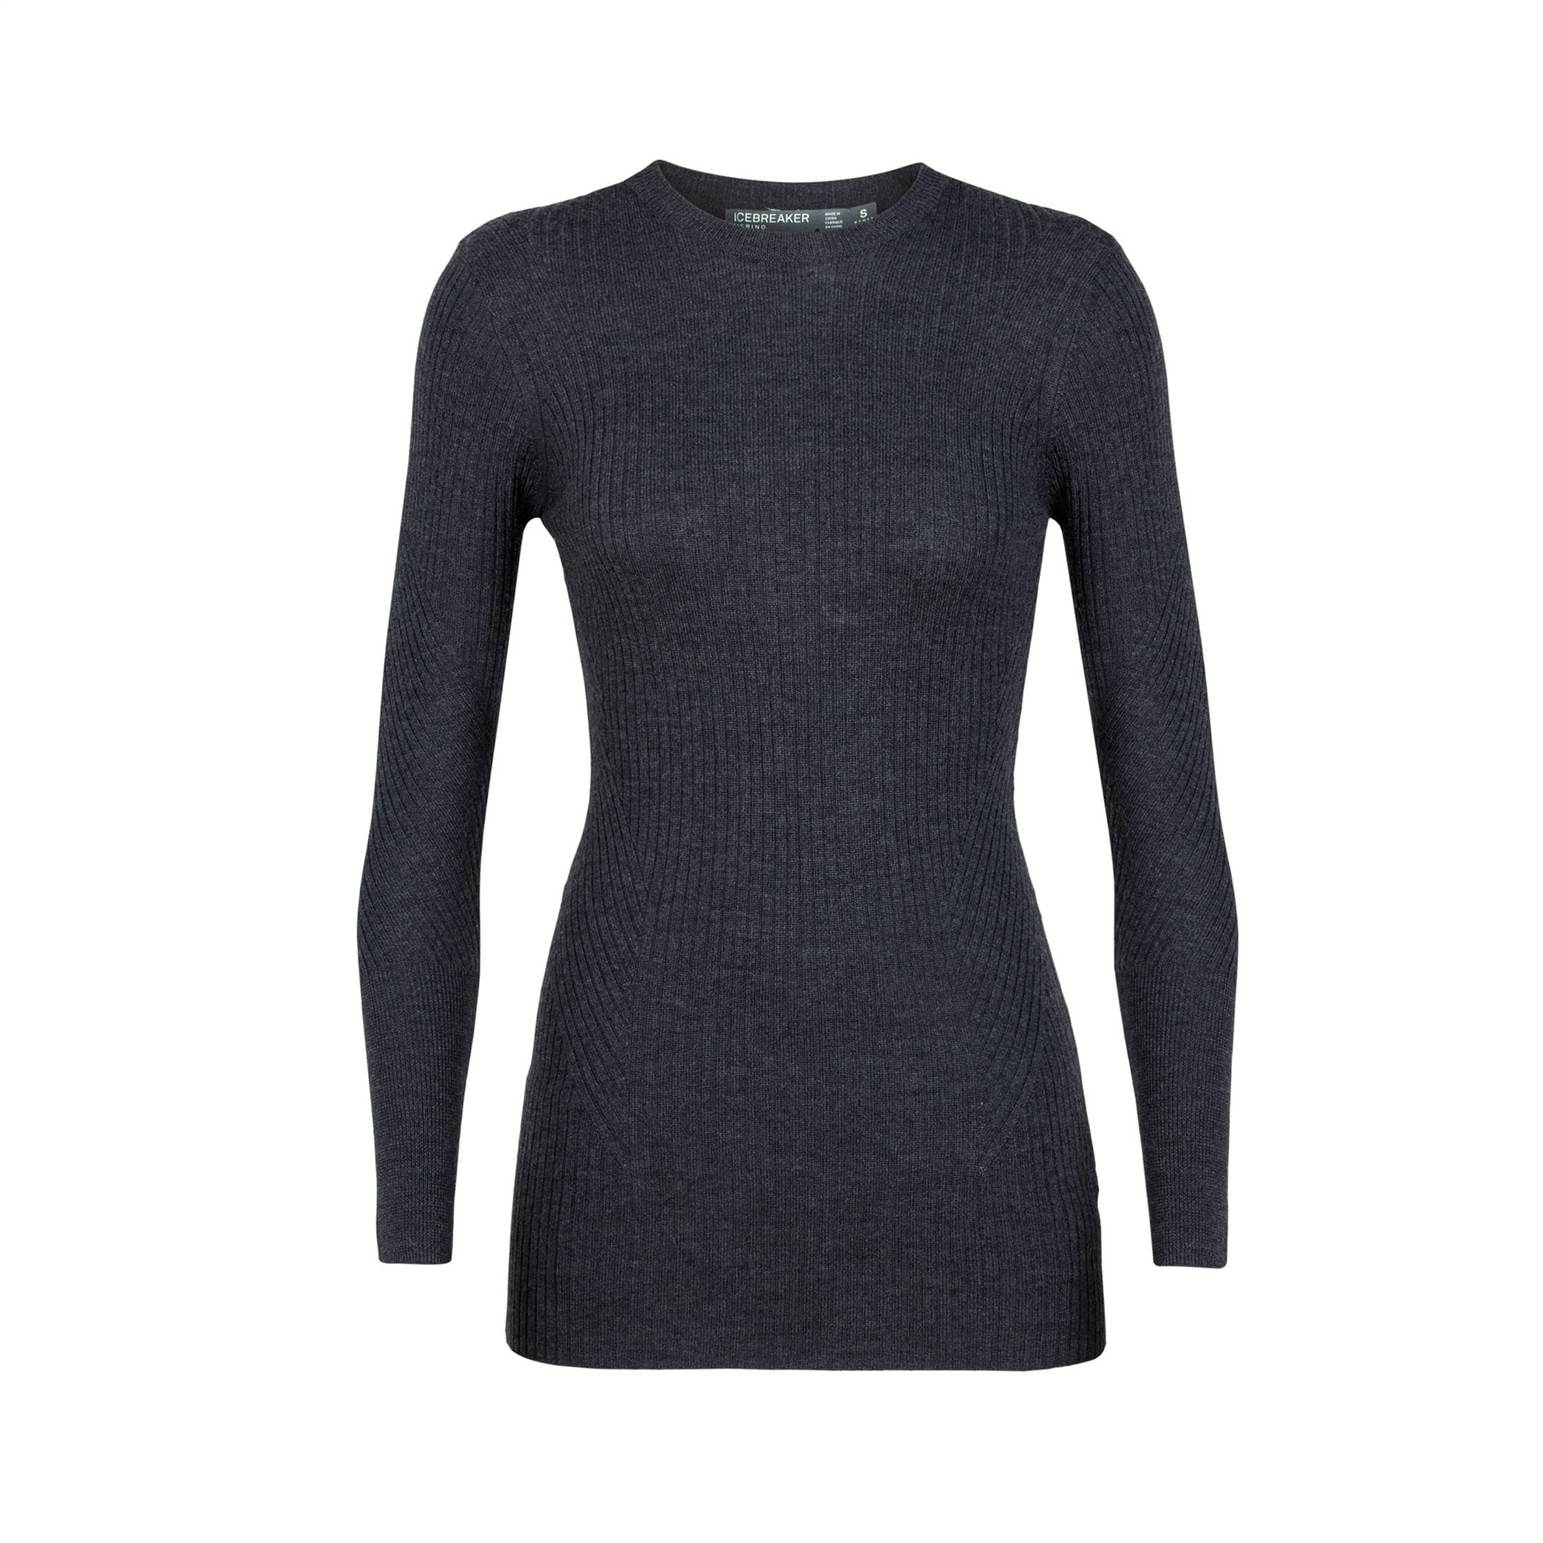 Valley Slim Crewe Sweater - Women's